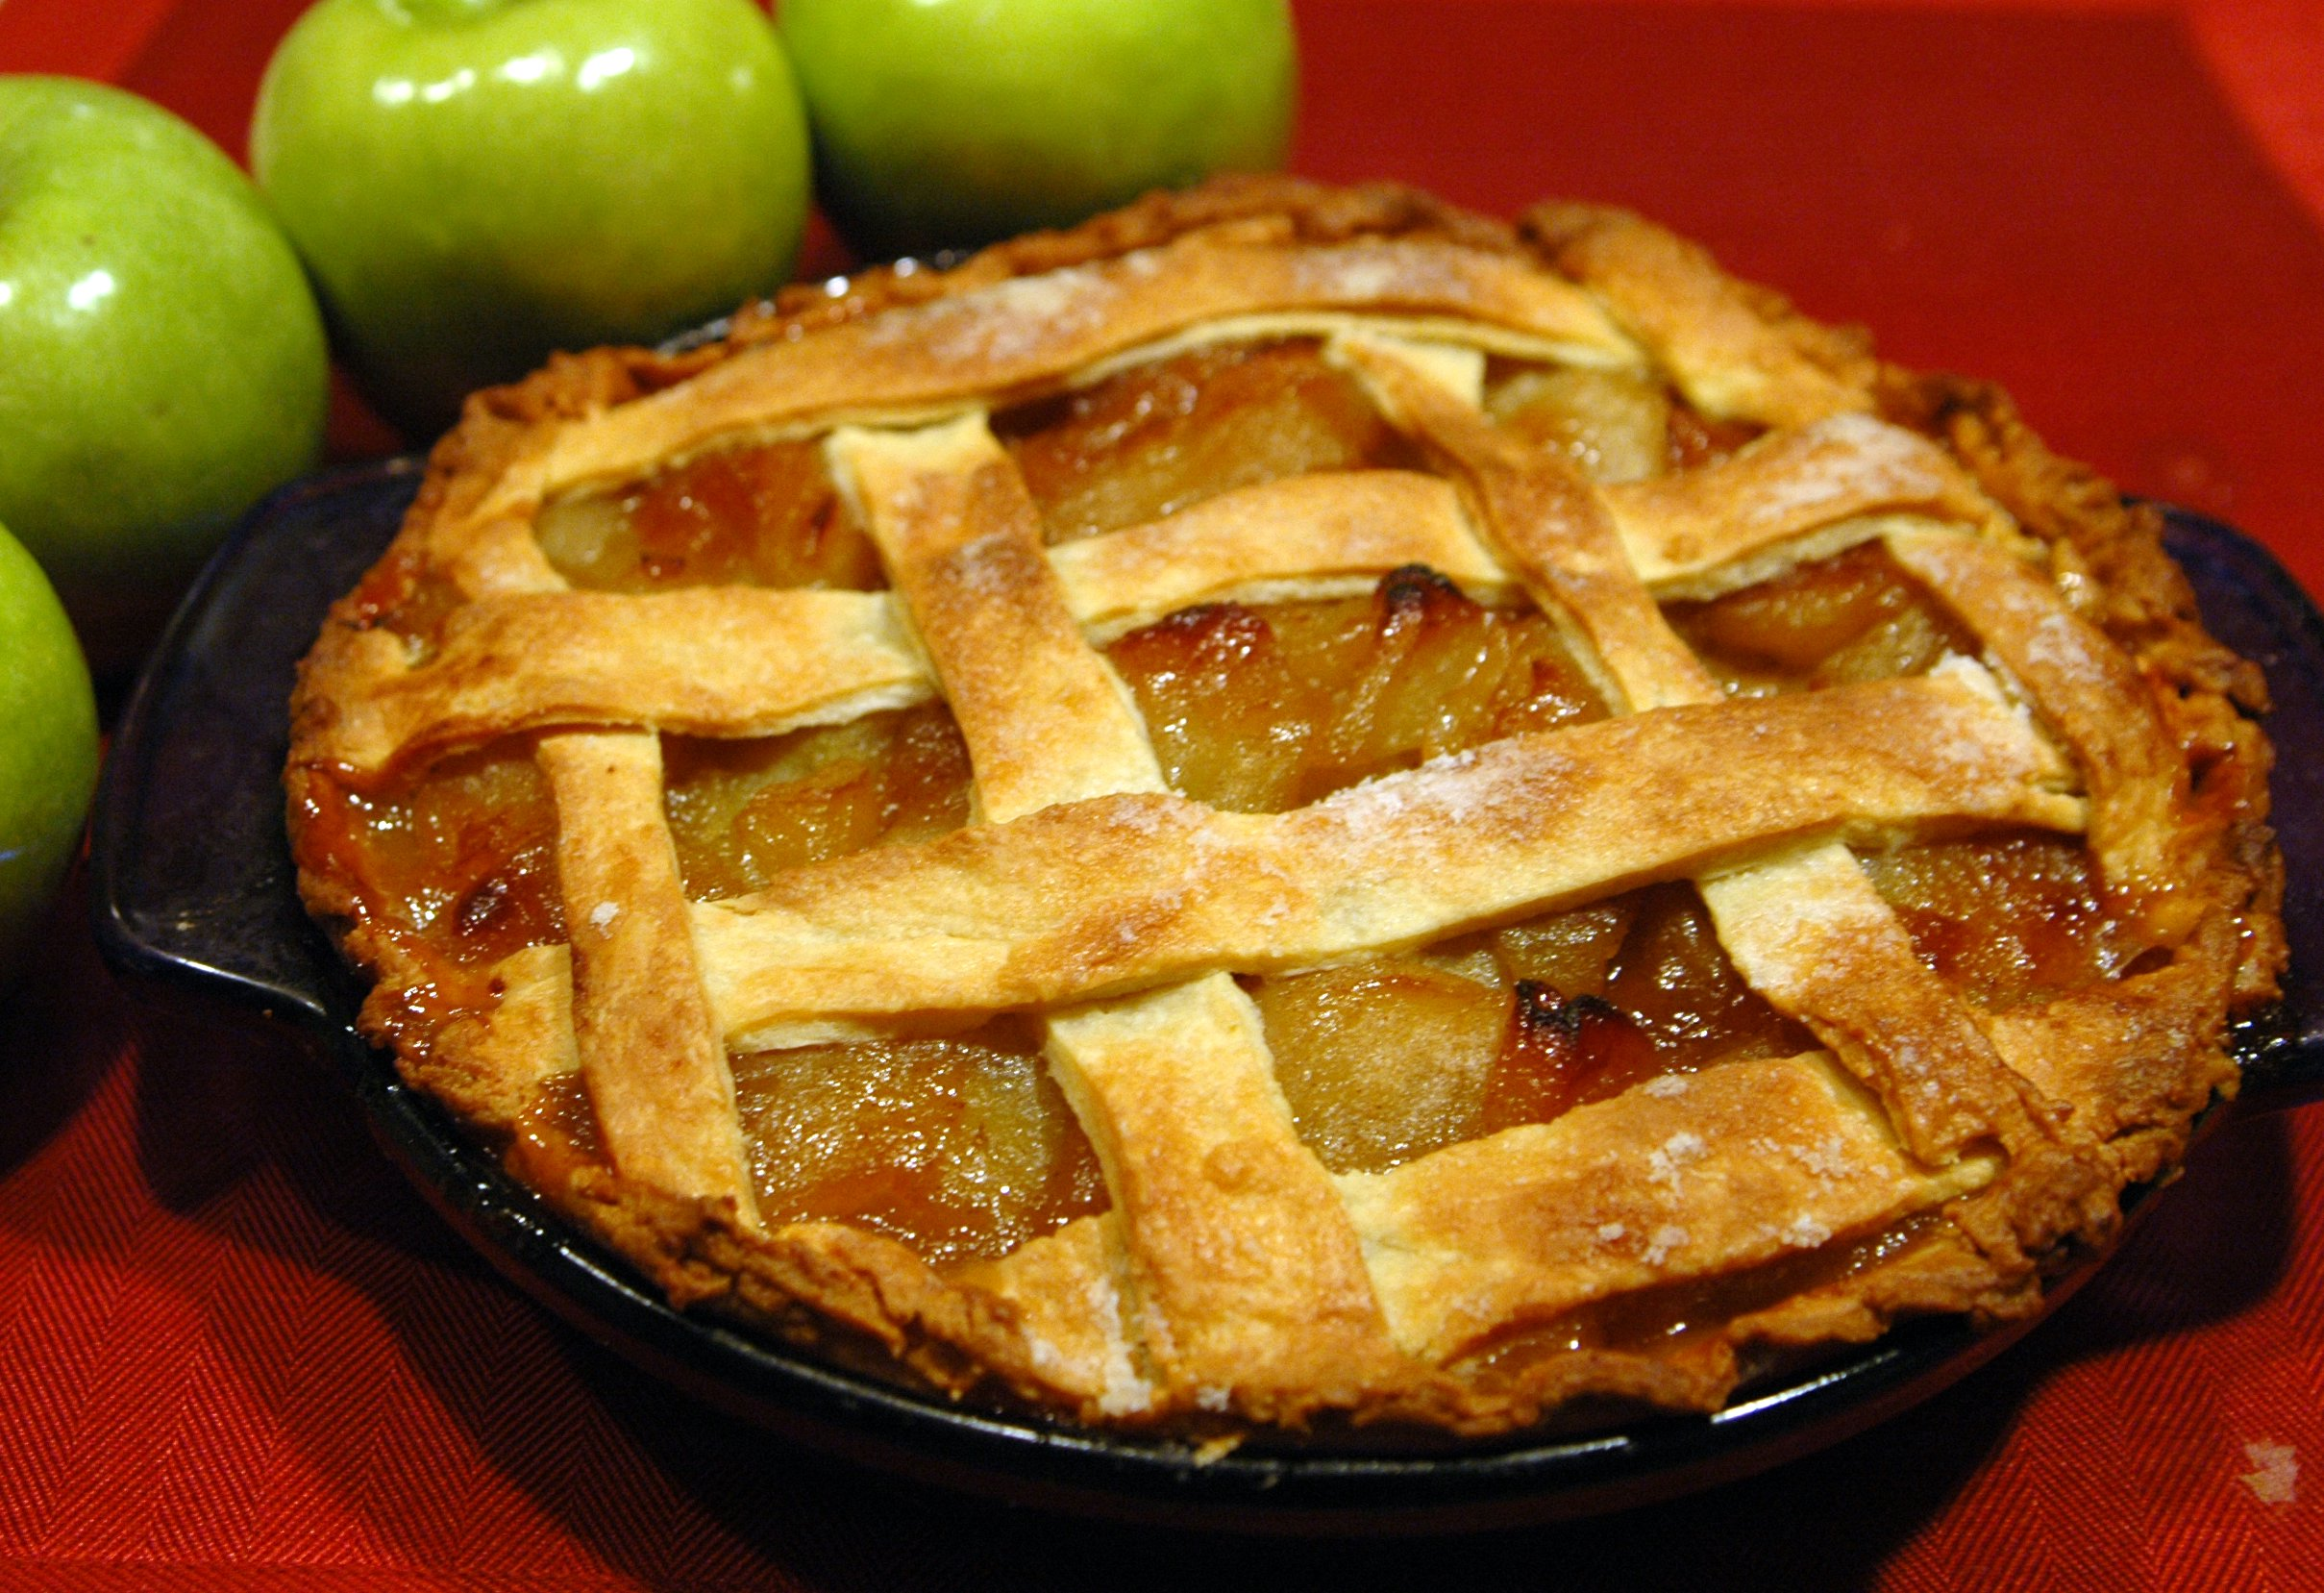 Apple Pie with Fresh Apples